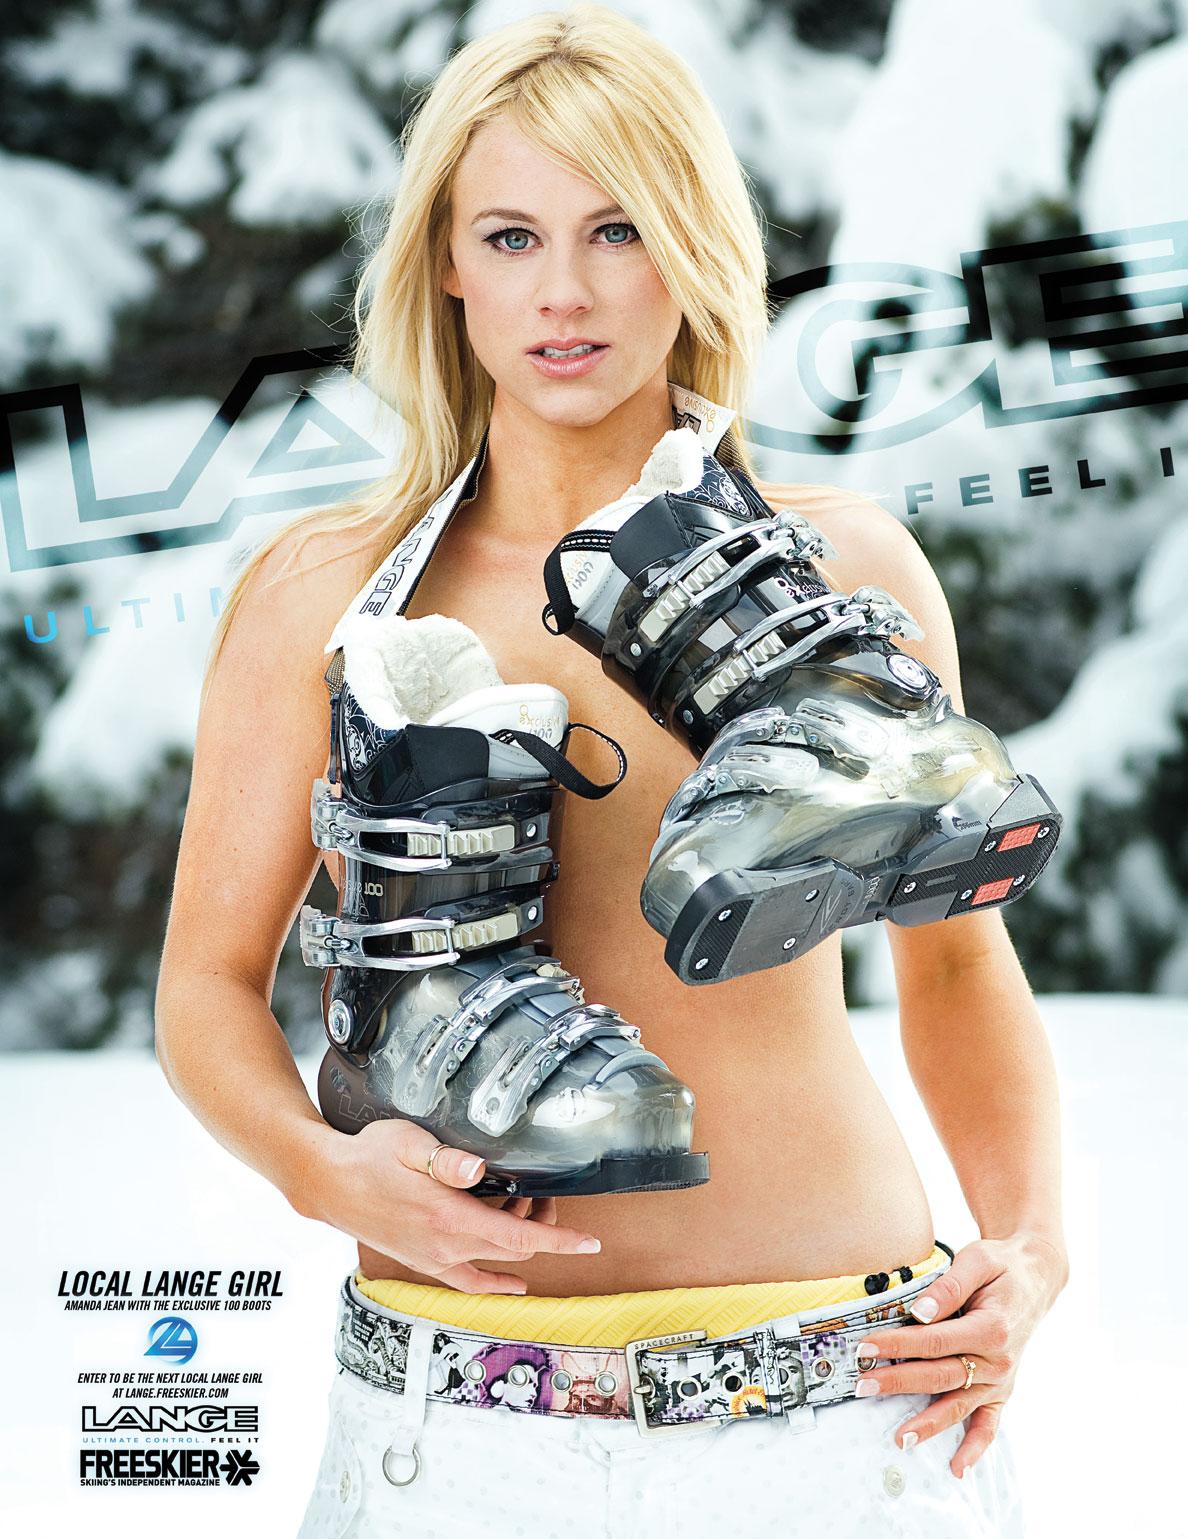 2009 Lange Girl Amanda Jean